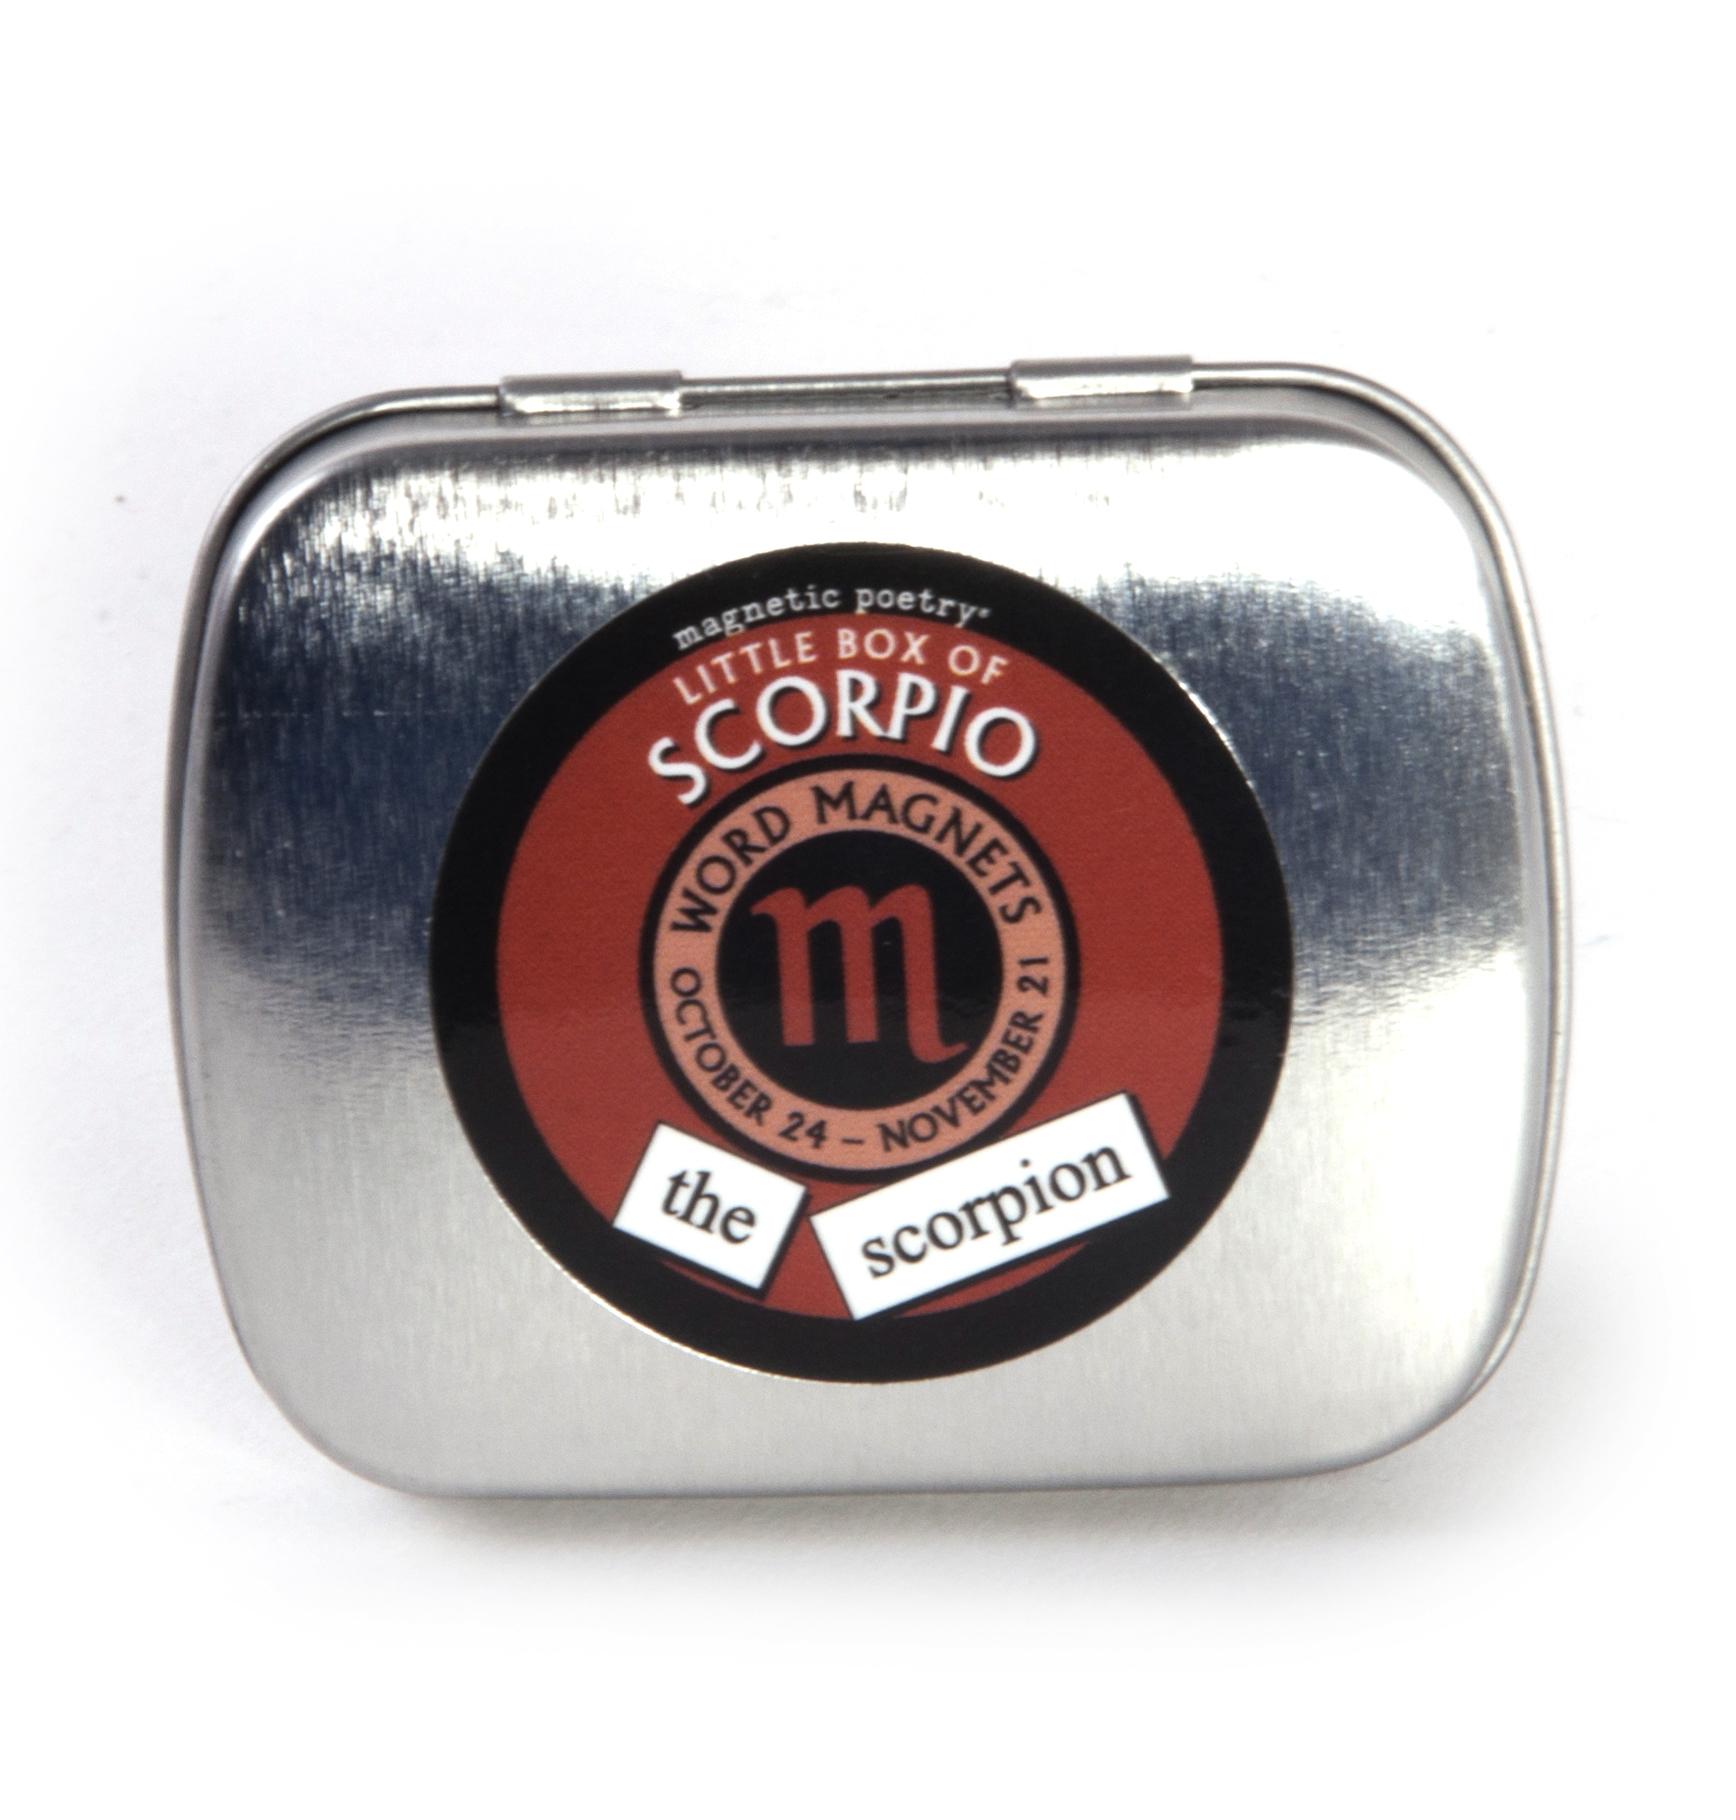 Little Box Of Scorpio Word Magnets The Scorpion Fridge